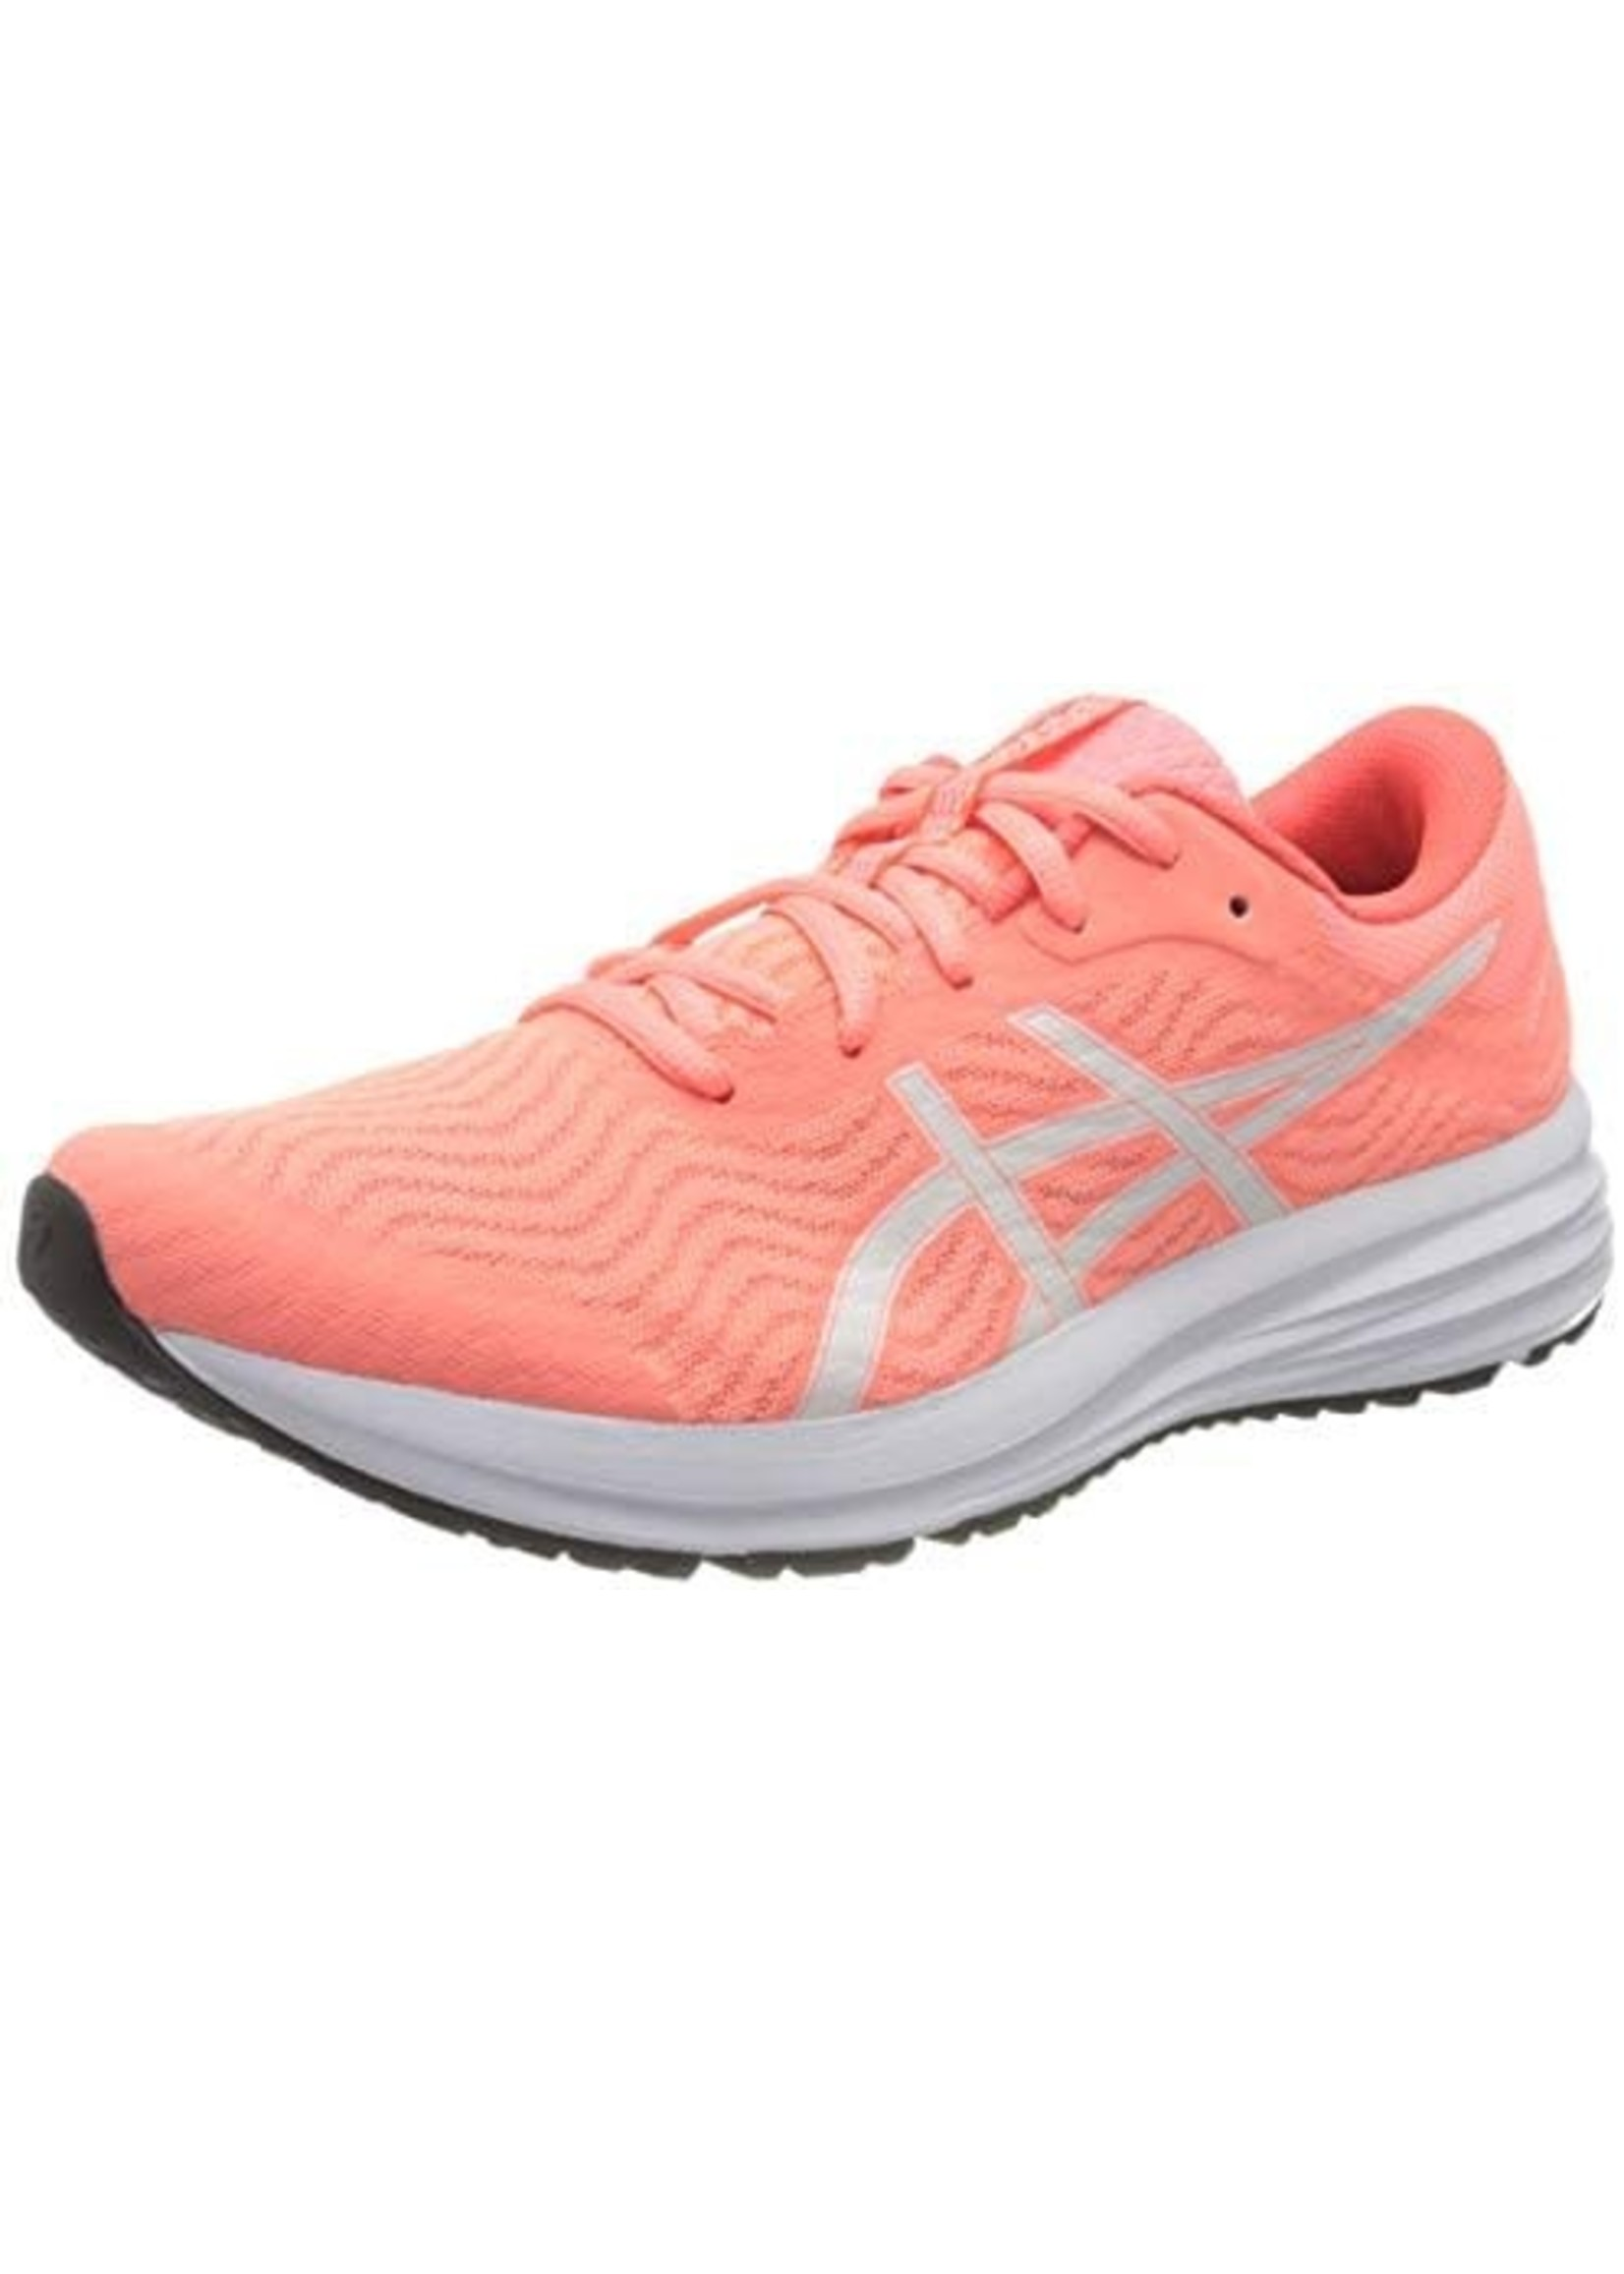 Asics Asics Patriot 12 Womens Running Shoe, Sun Coral/White,(2021)